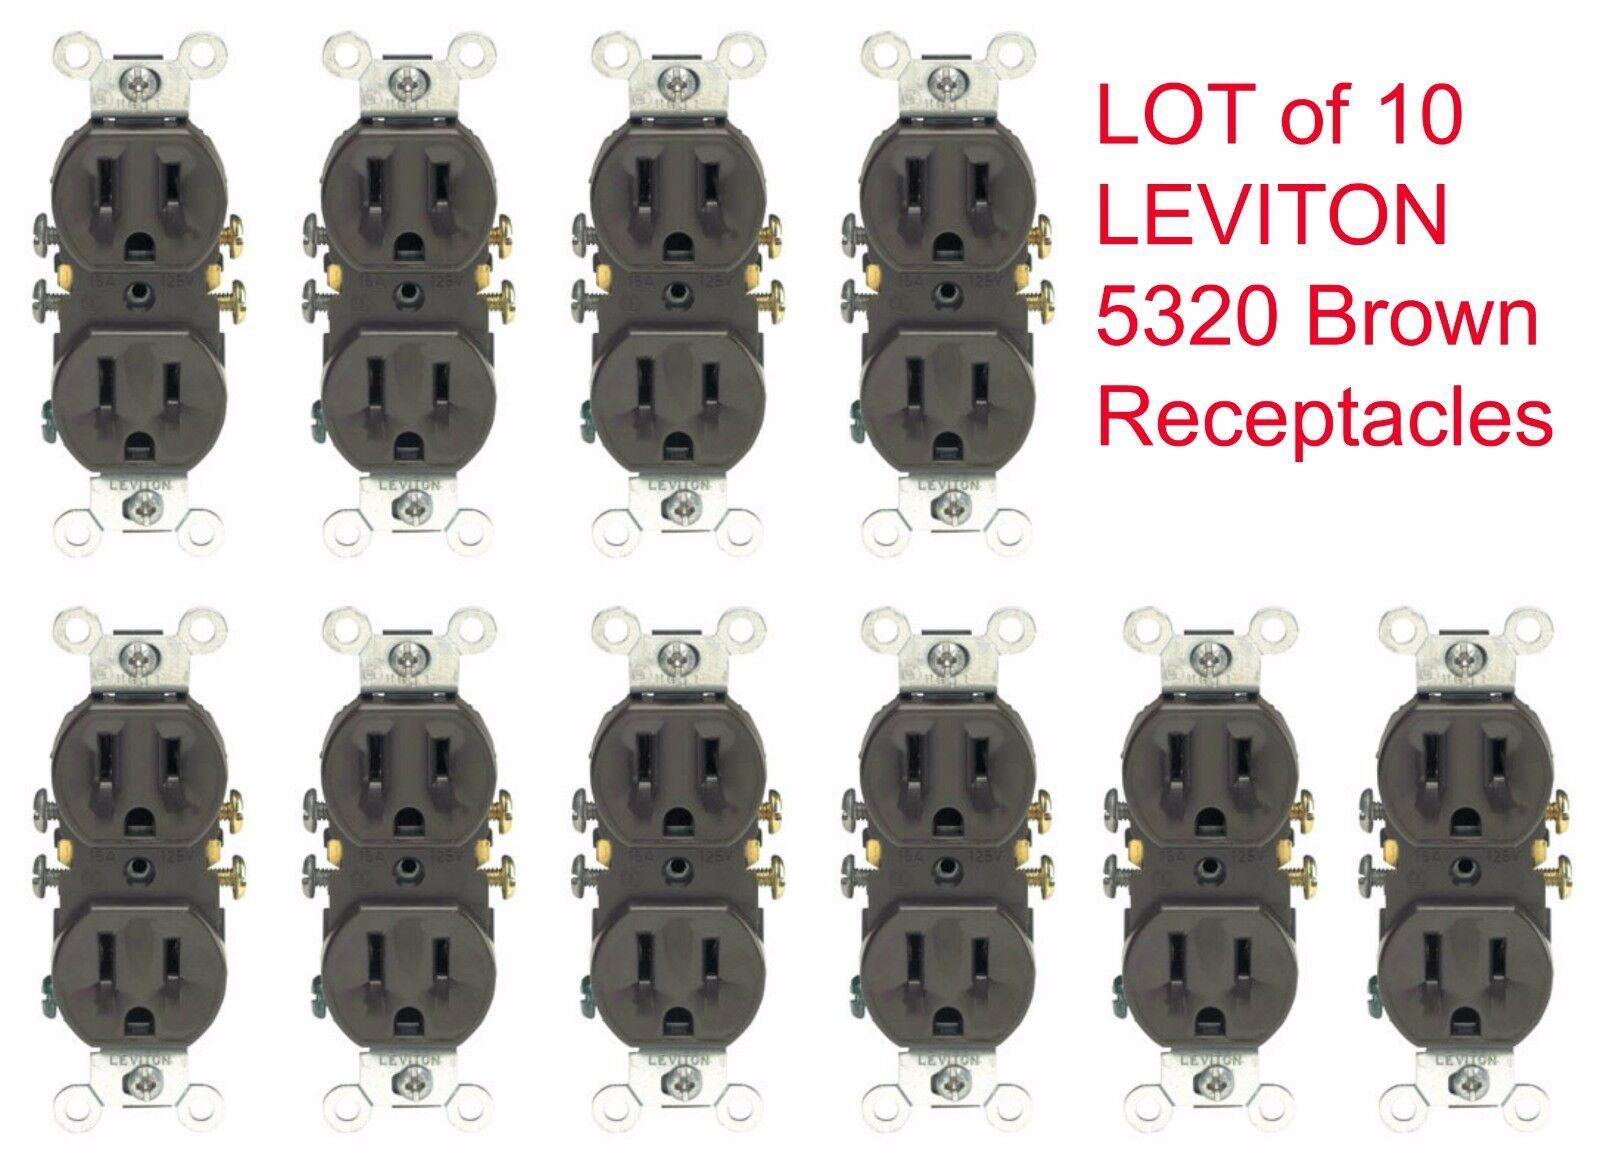 Leviton Brown Duplex Receptacle Outlets 15a 125v | eBay